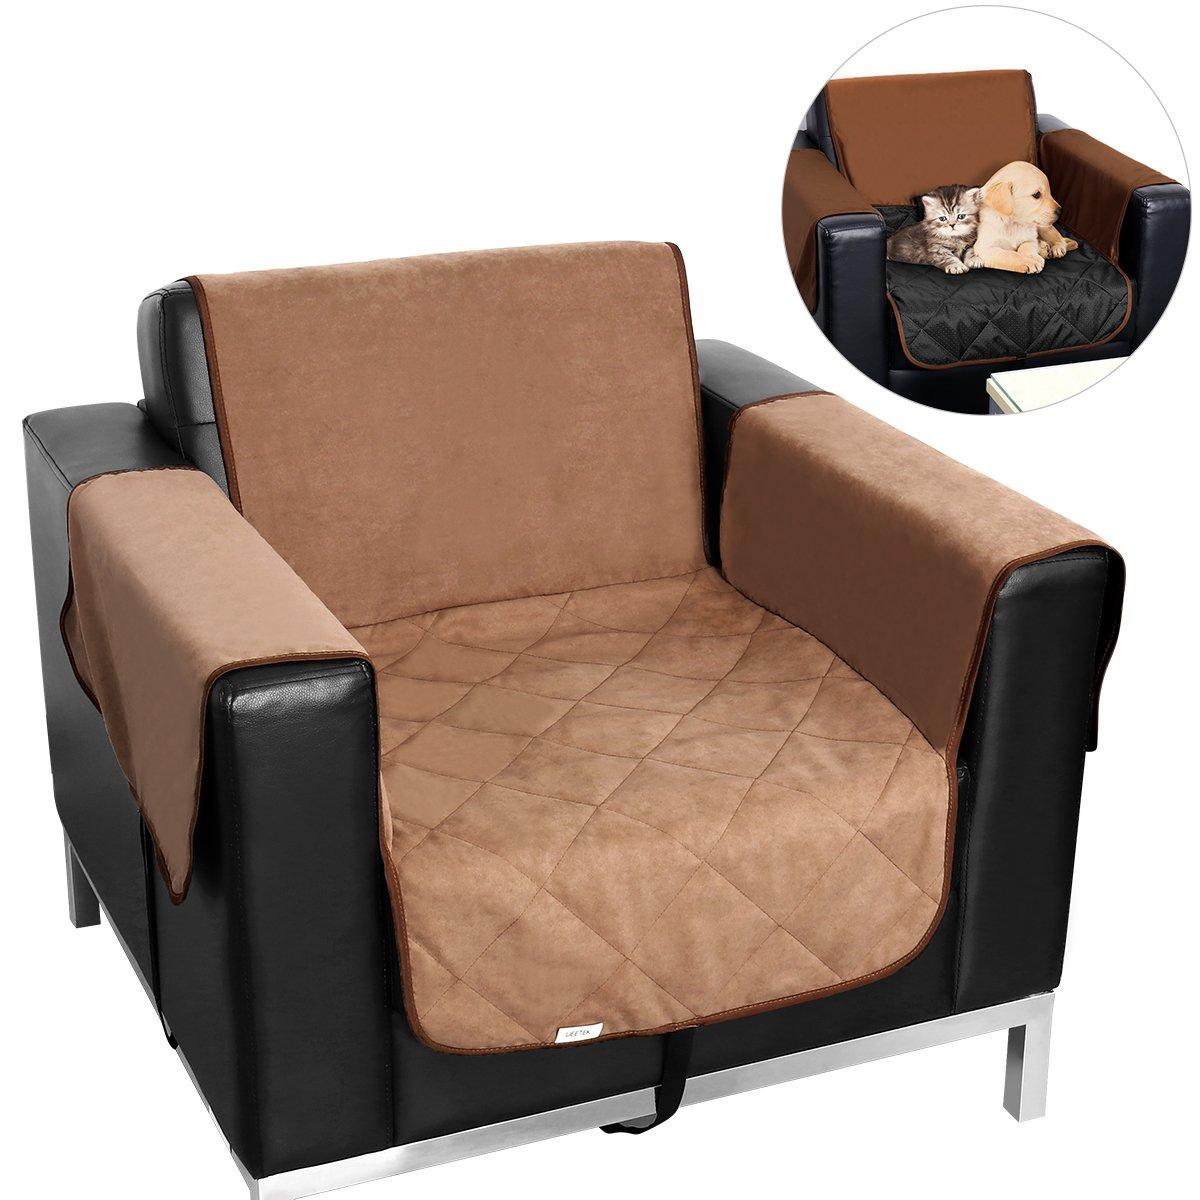 ueetek one-seatソファーSlipcover防水ペット犬猫ソファ椅子カバー家具プロテクター(カーキ)   B077CJZDSY